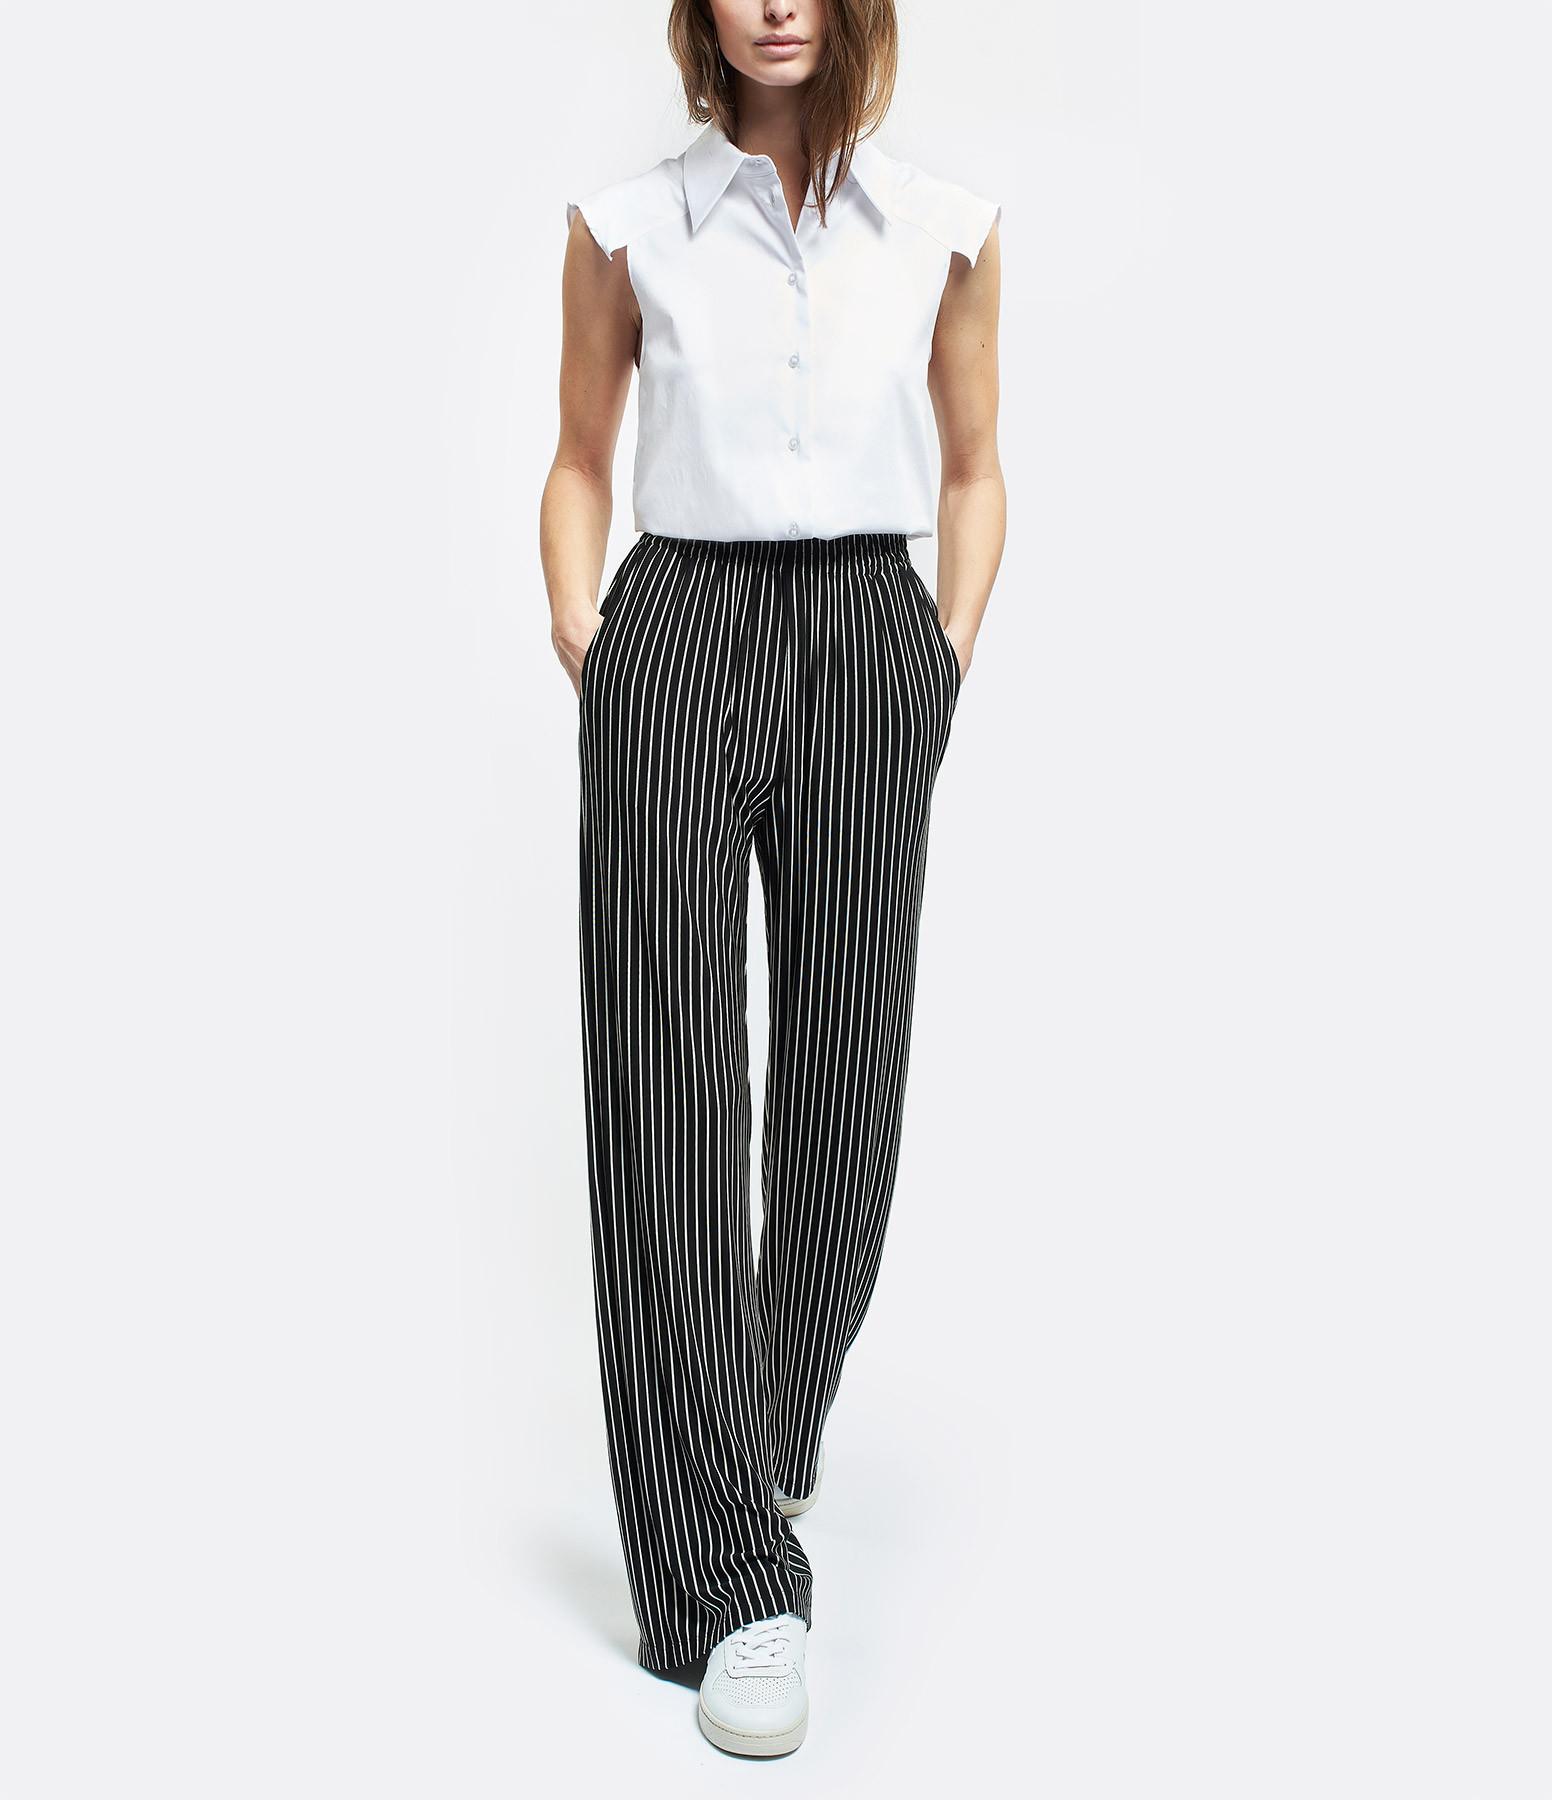 MM6 MAISON MARGIELA - Pantalon Palazzo Rayures Noir Blanc